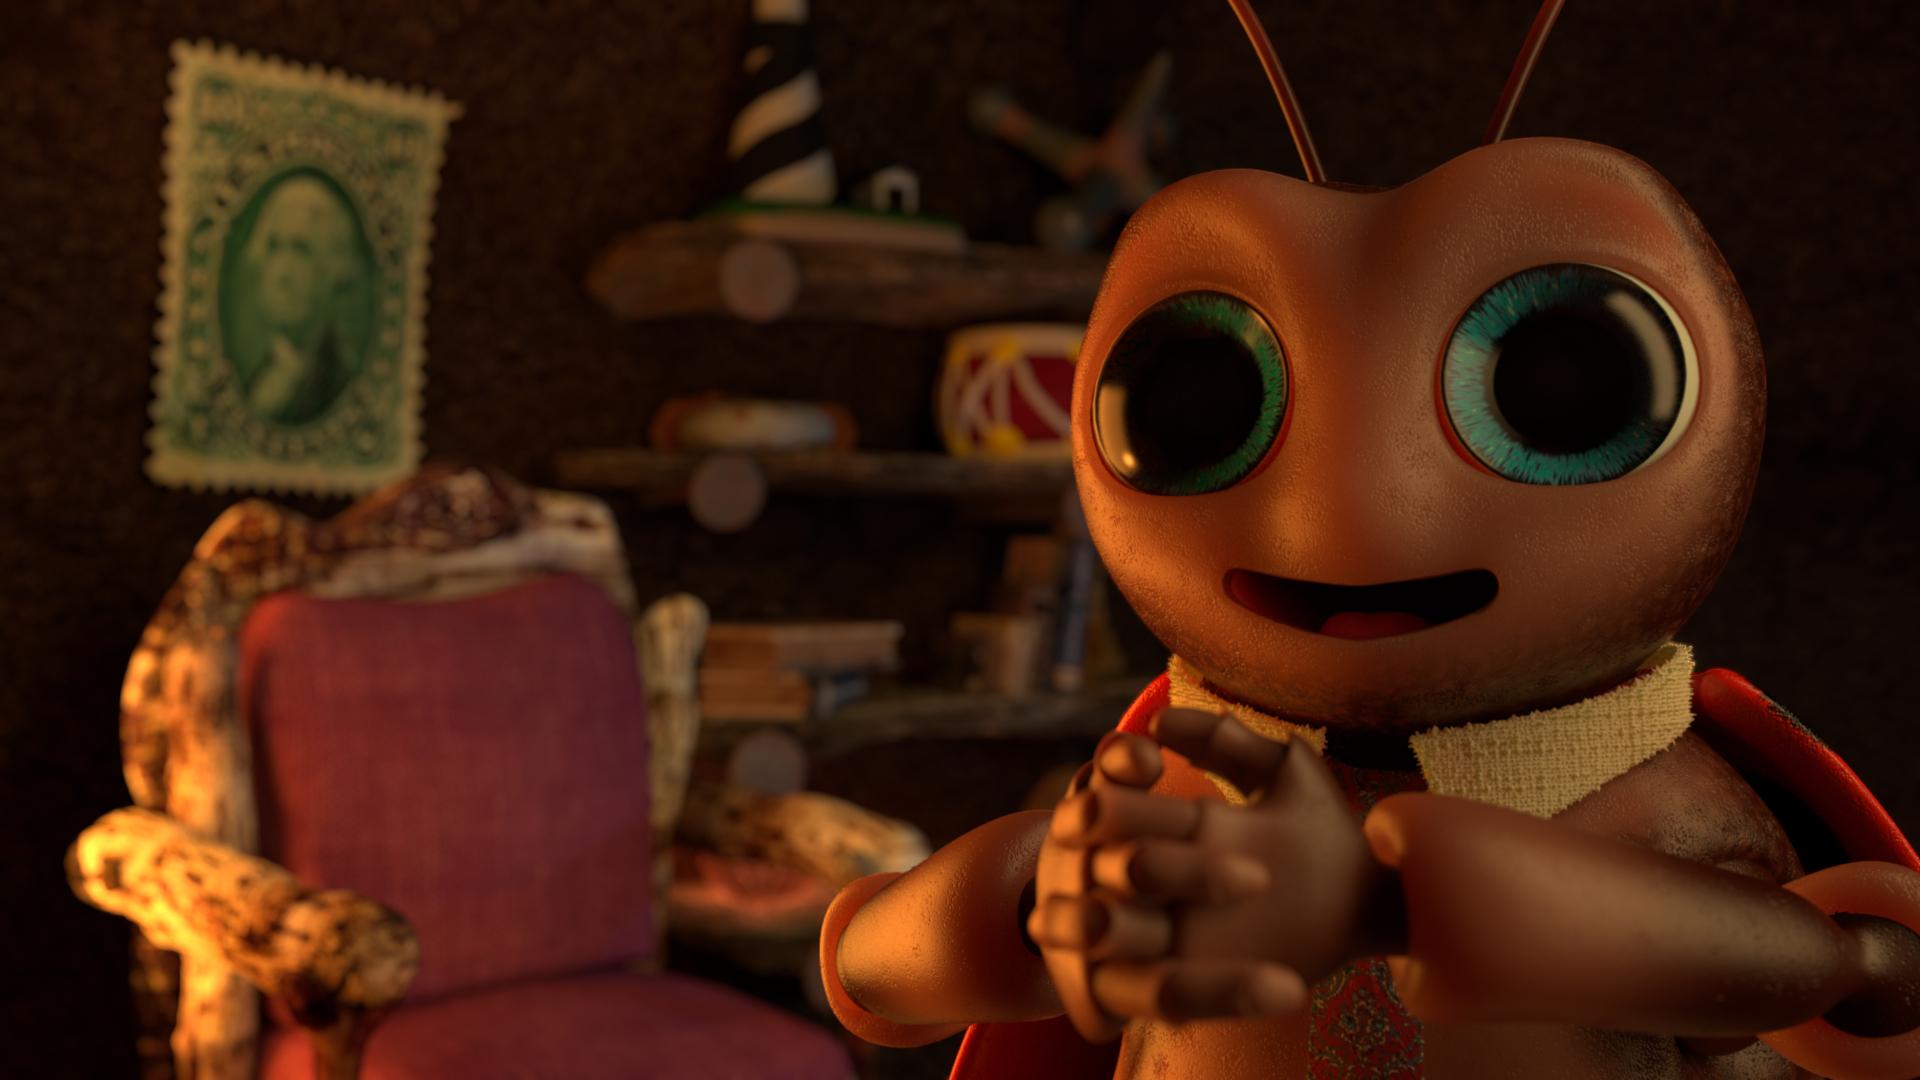 Bugspray 2016 - Lighting Arnold 4 Renderer for Maya